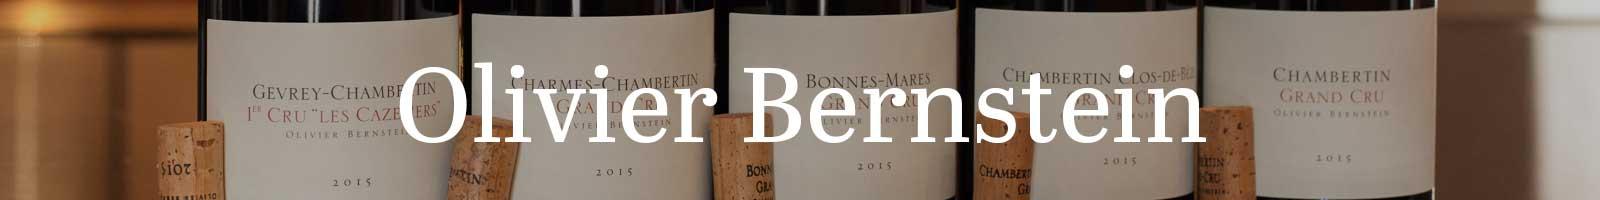 Essential Winemaker of France: Olivier Bernstein